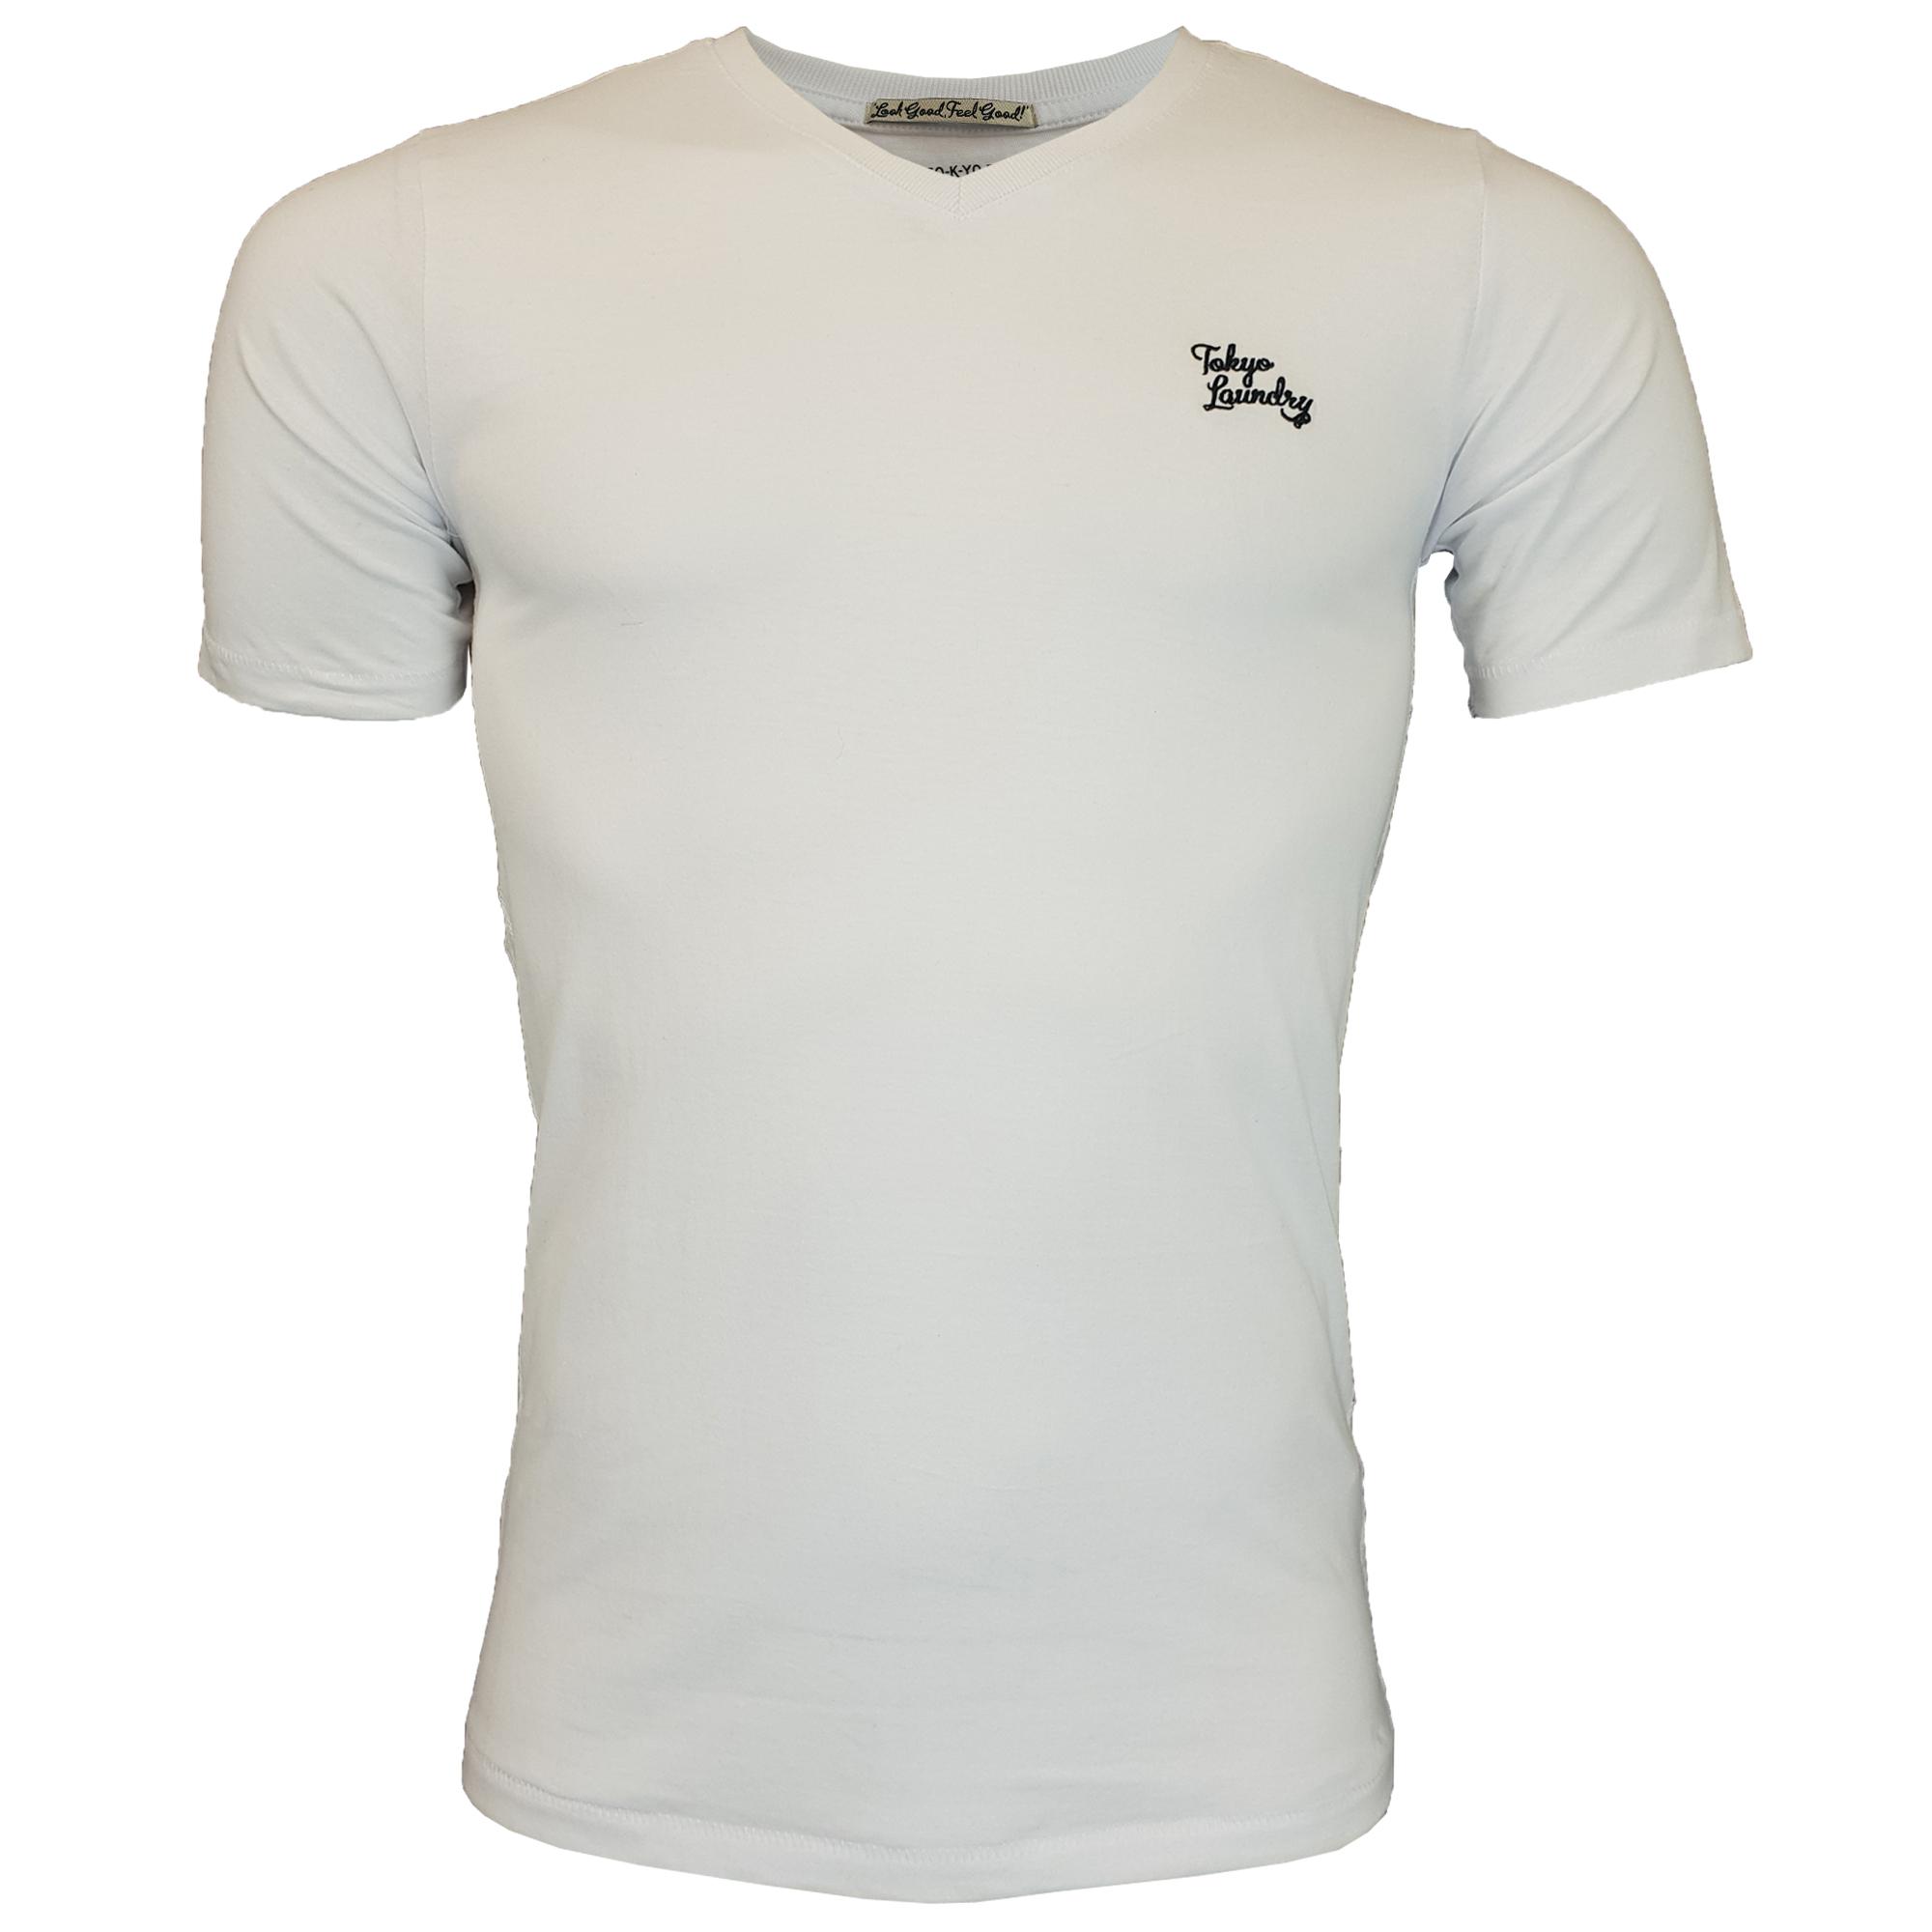 New-Mens-Tokyo-Laundry-3-Pack-Plain-Combed-Cotton-T-shirt-Top-Plain-Mix-Colours thumbnail 6